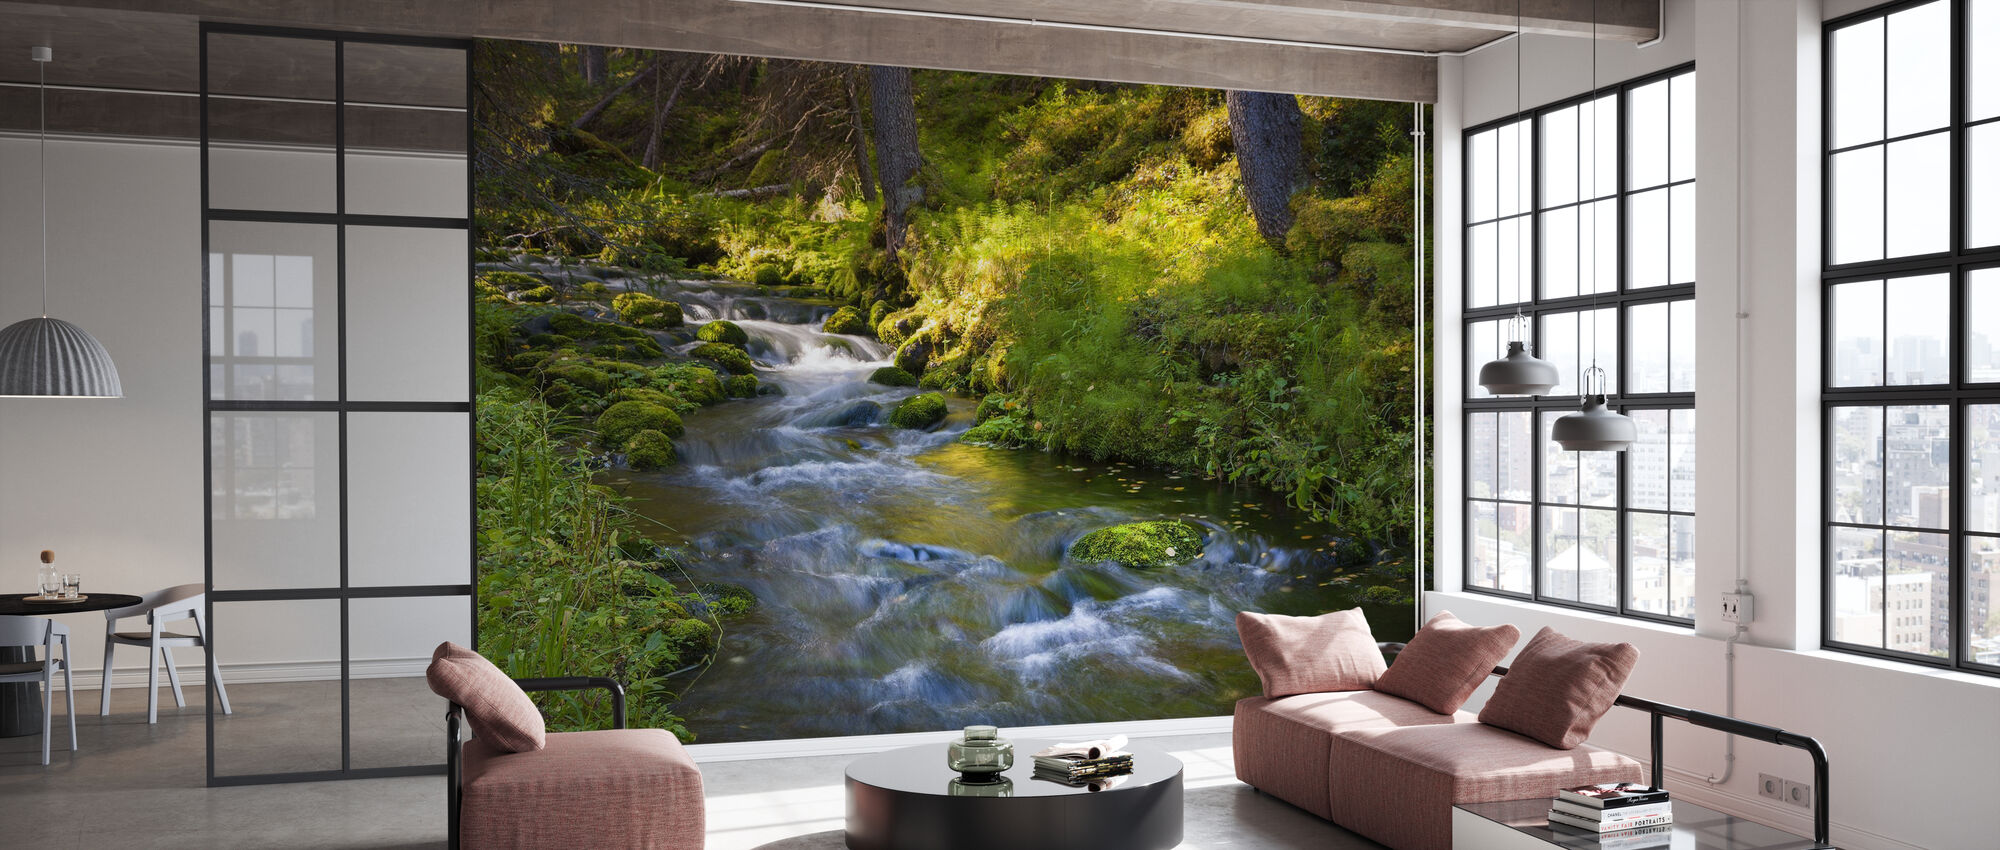 Finnish Forest River - Wallpaper - Office